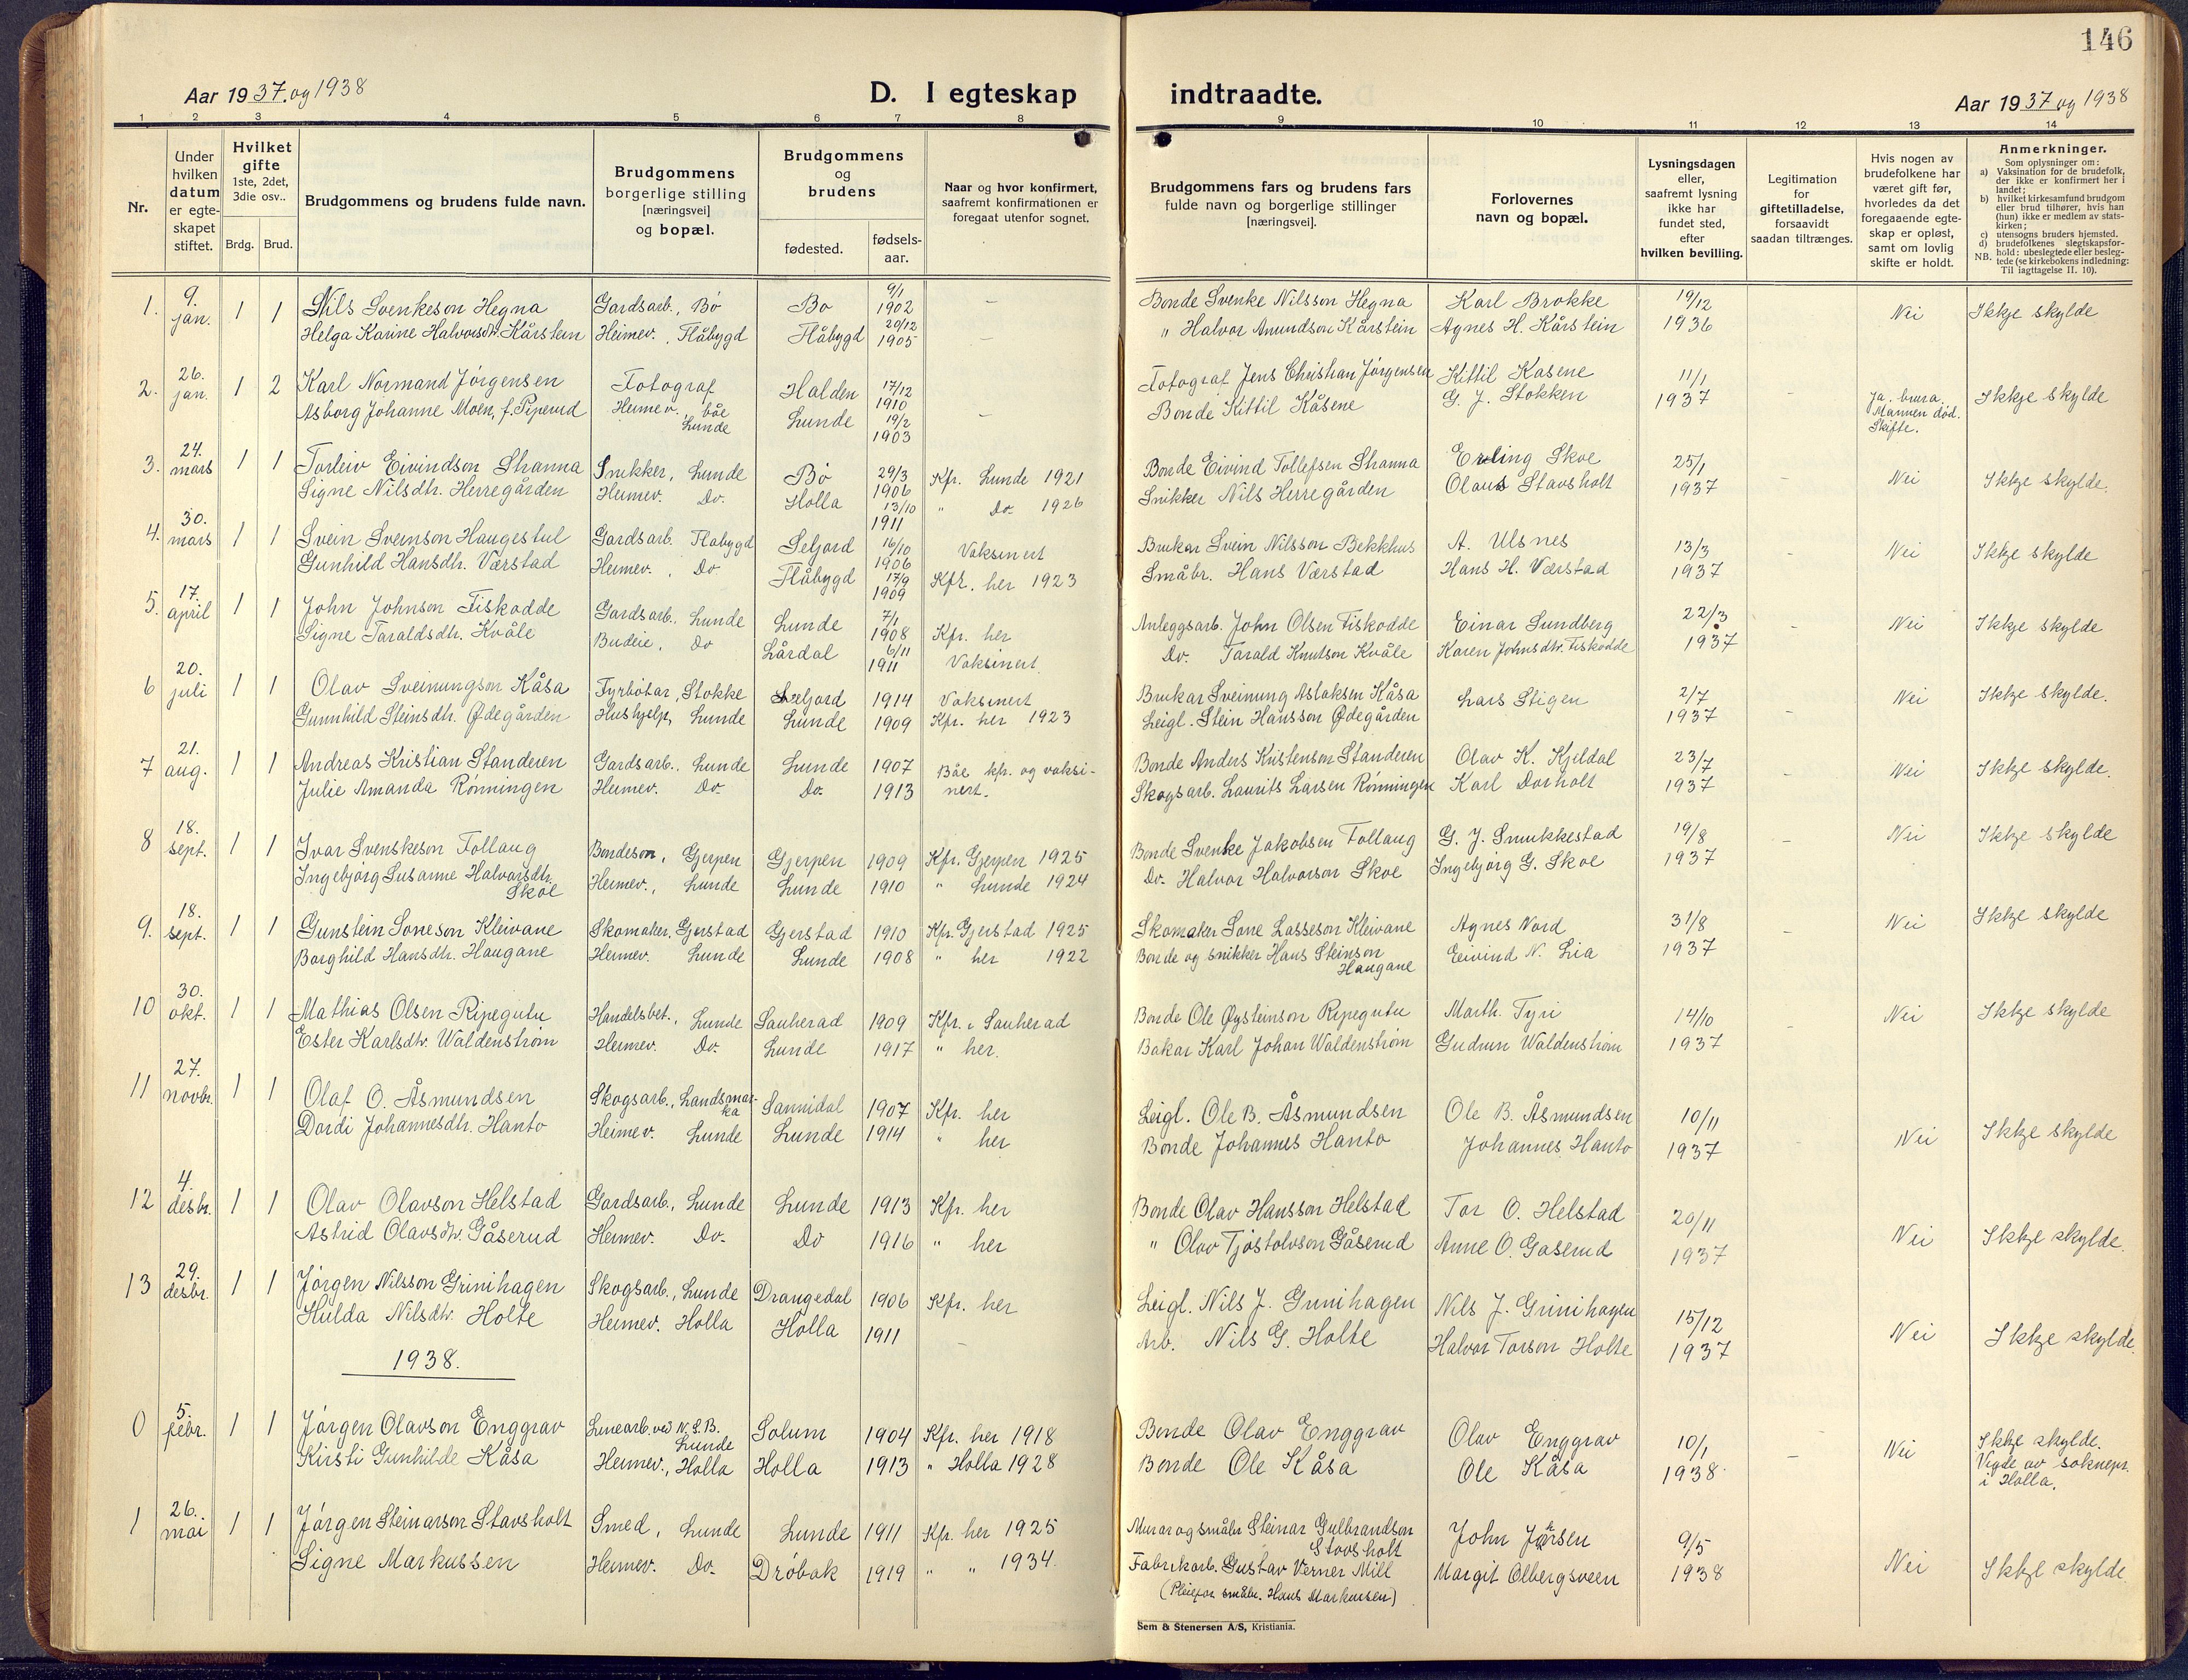 SAKO, Lunde kirkebøker, F/Fa/L0006: Ministerialbok nr. I 6, 1922-1940, s. 146